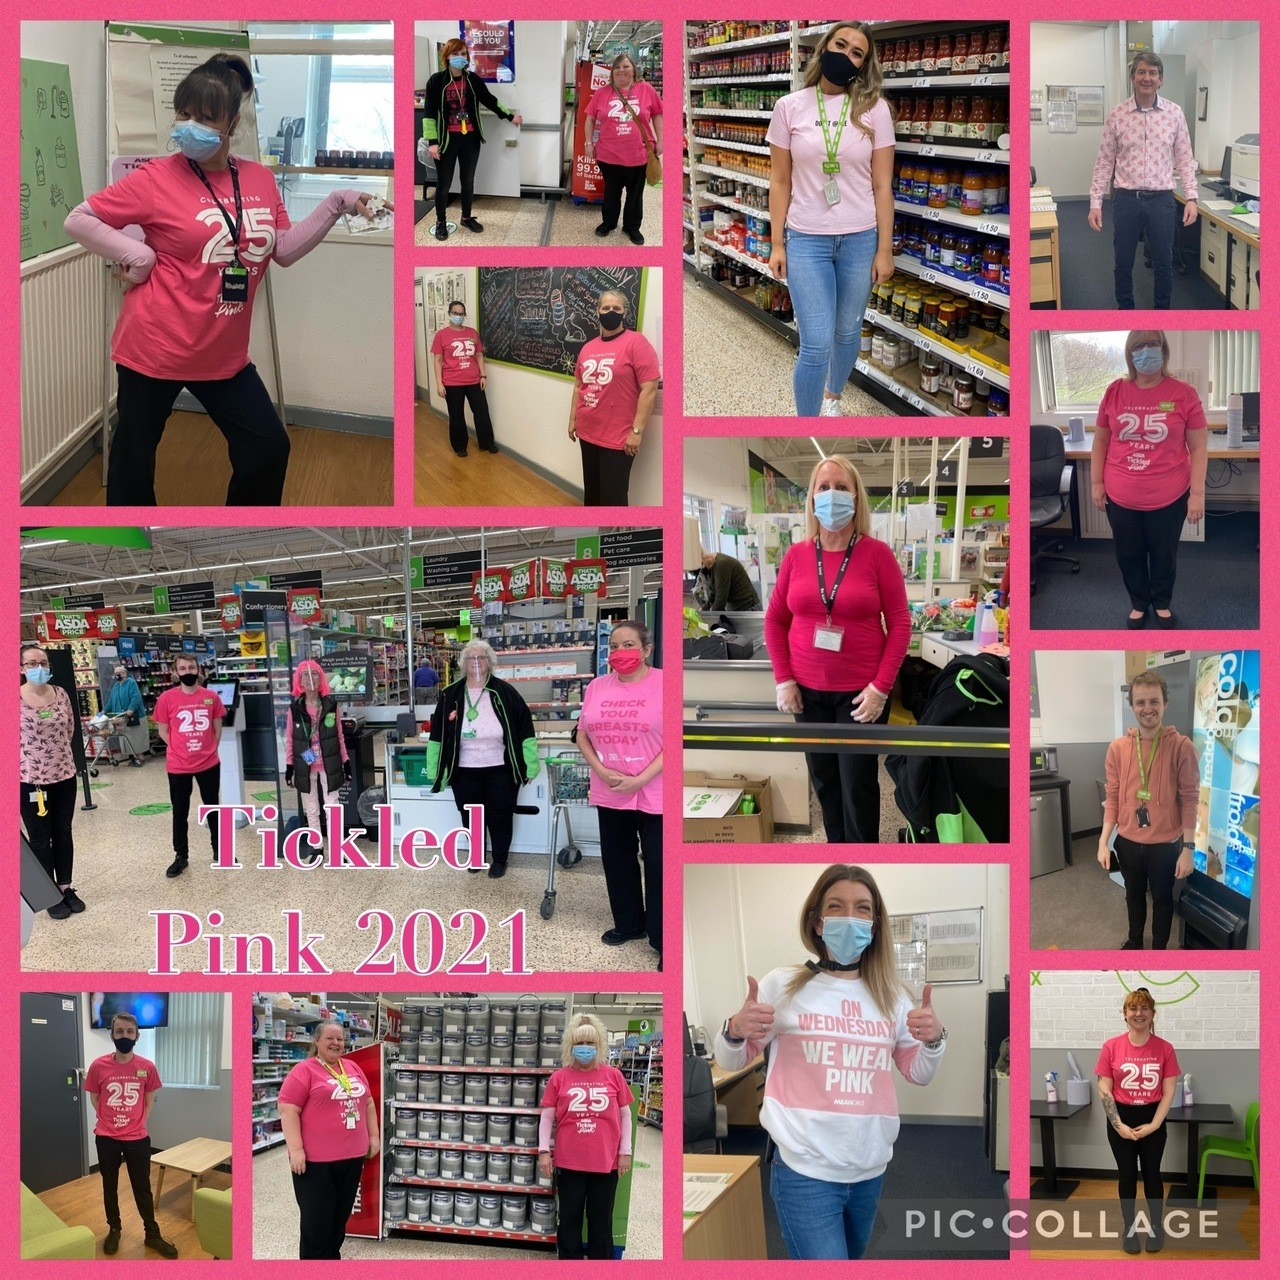 Tickled Pink marks 25 years | Asda Gosport